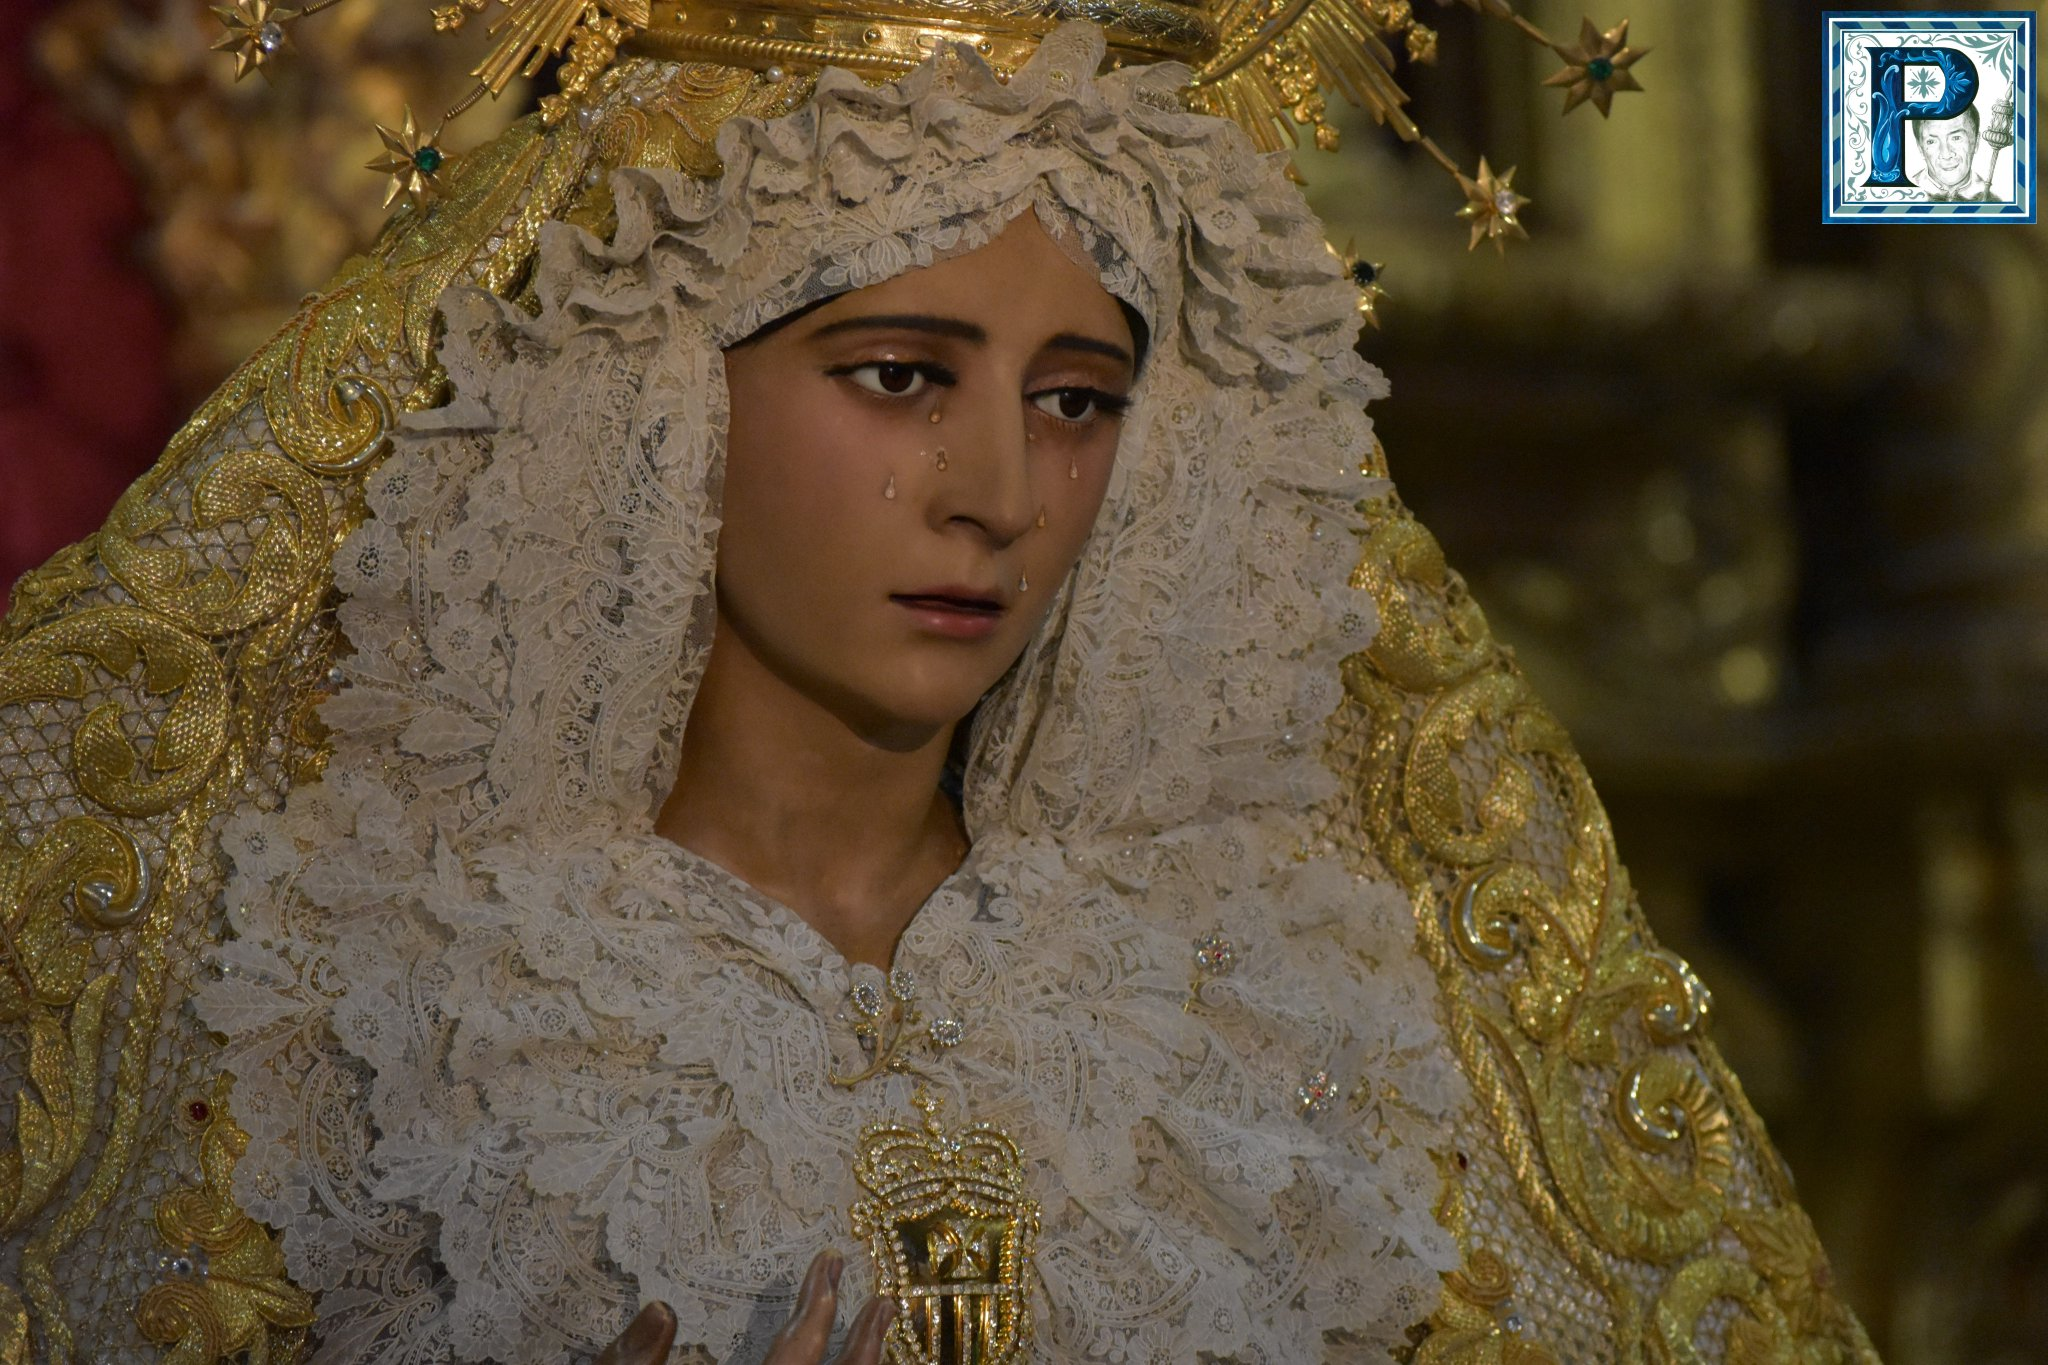 Velada en honor a Madre de Dios de la Misericordia